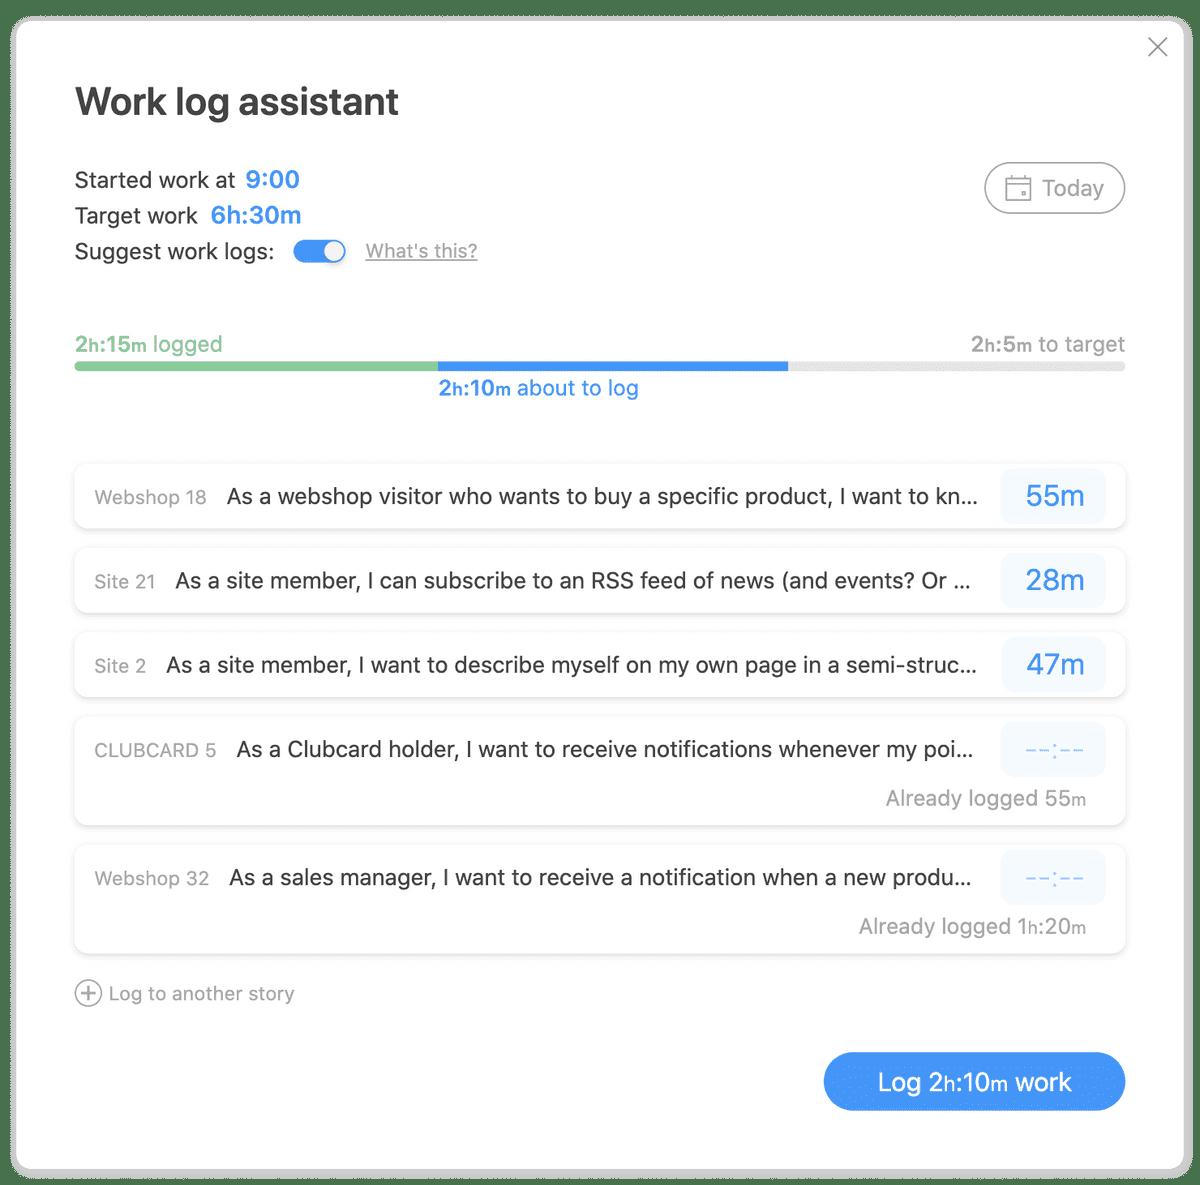 Work log assistant